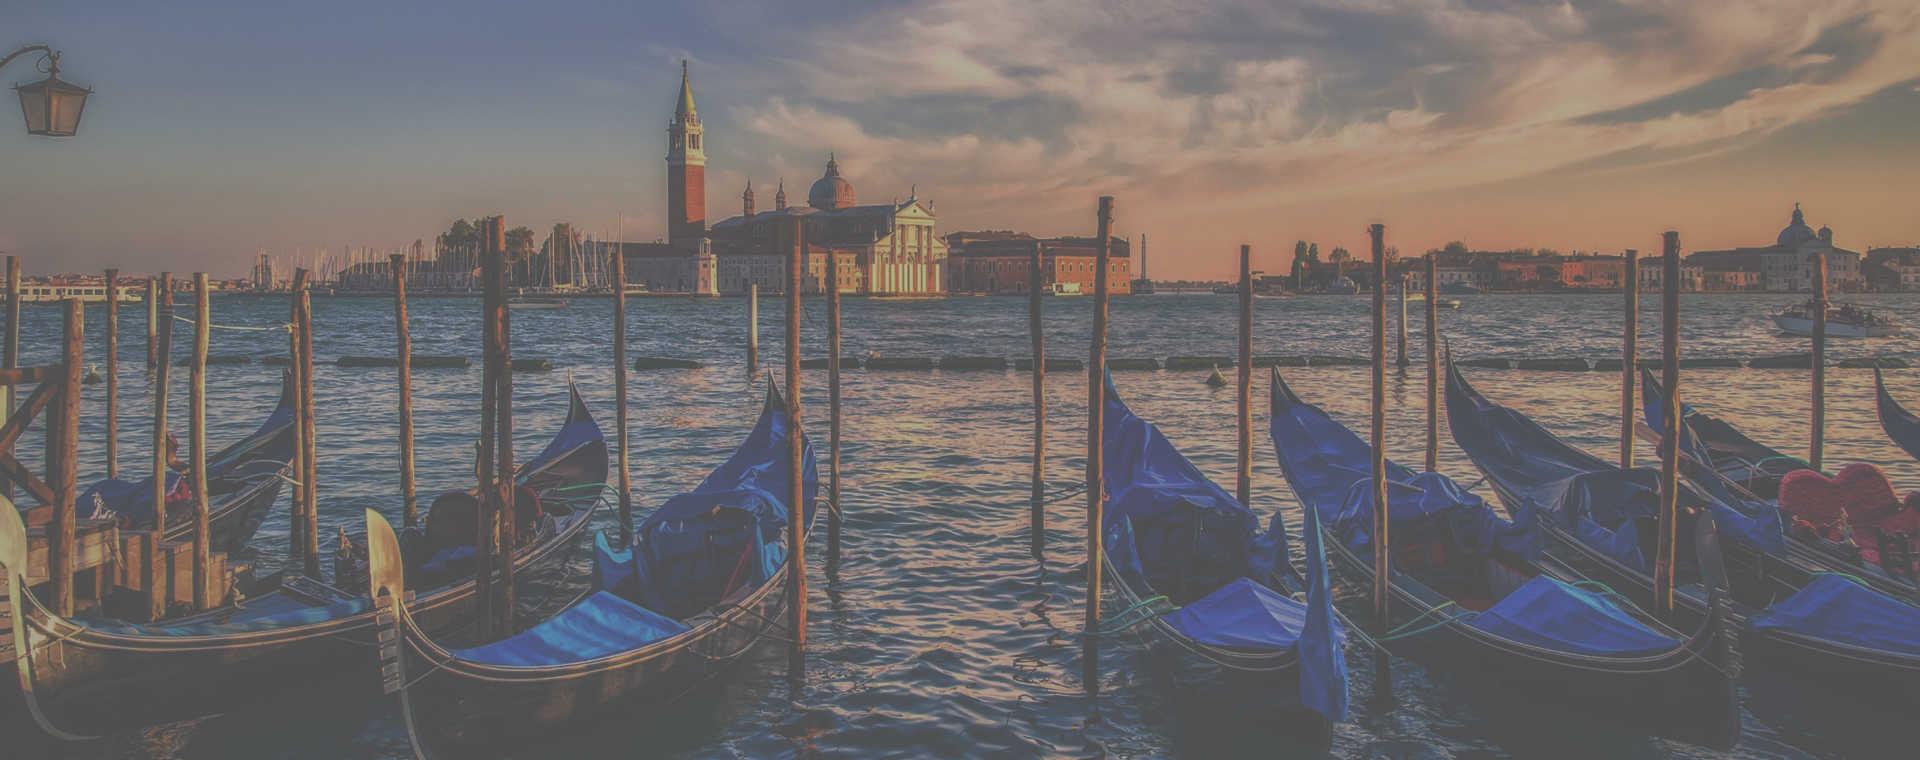 Aulas de italiano com professores experientes dark - Teste de nivelamento de italiano